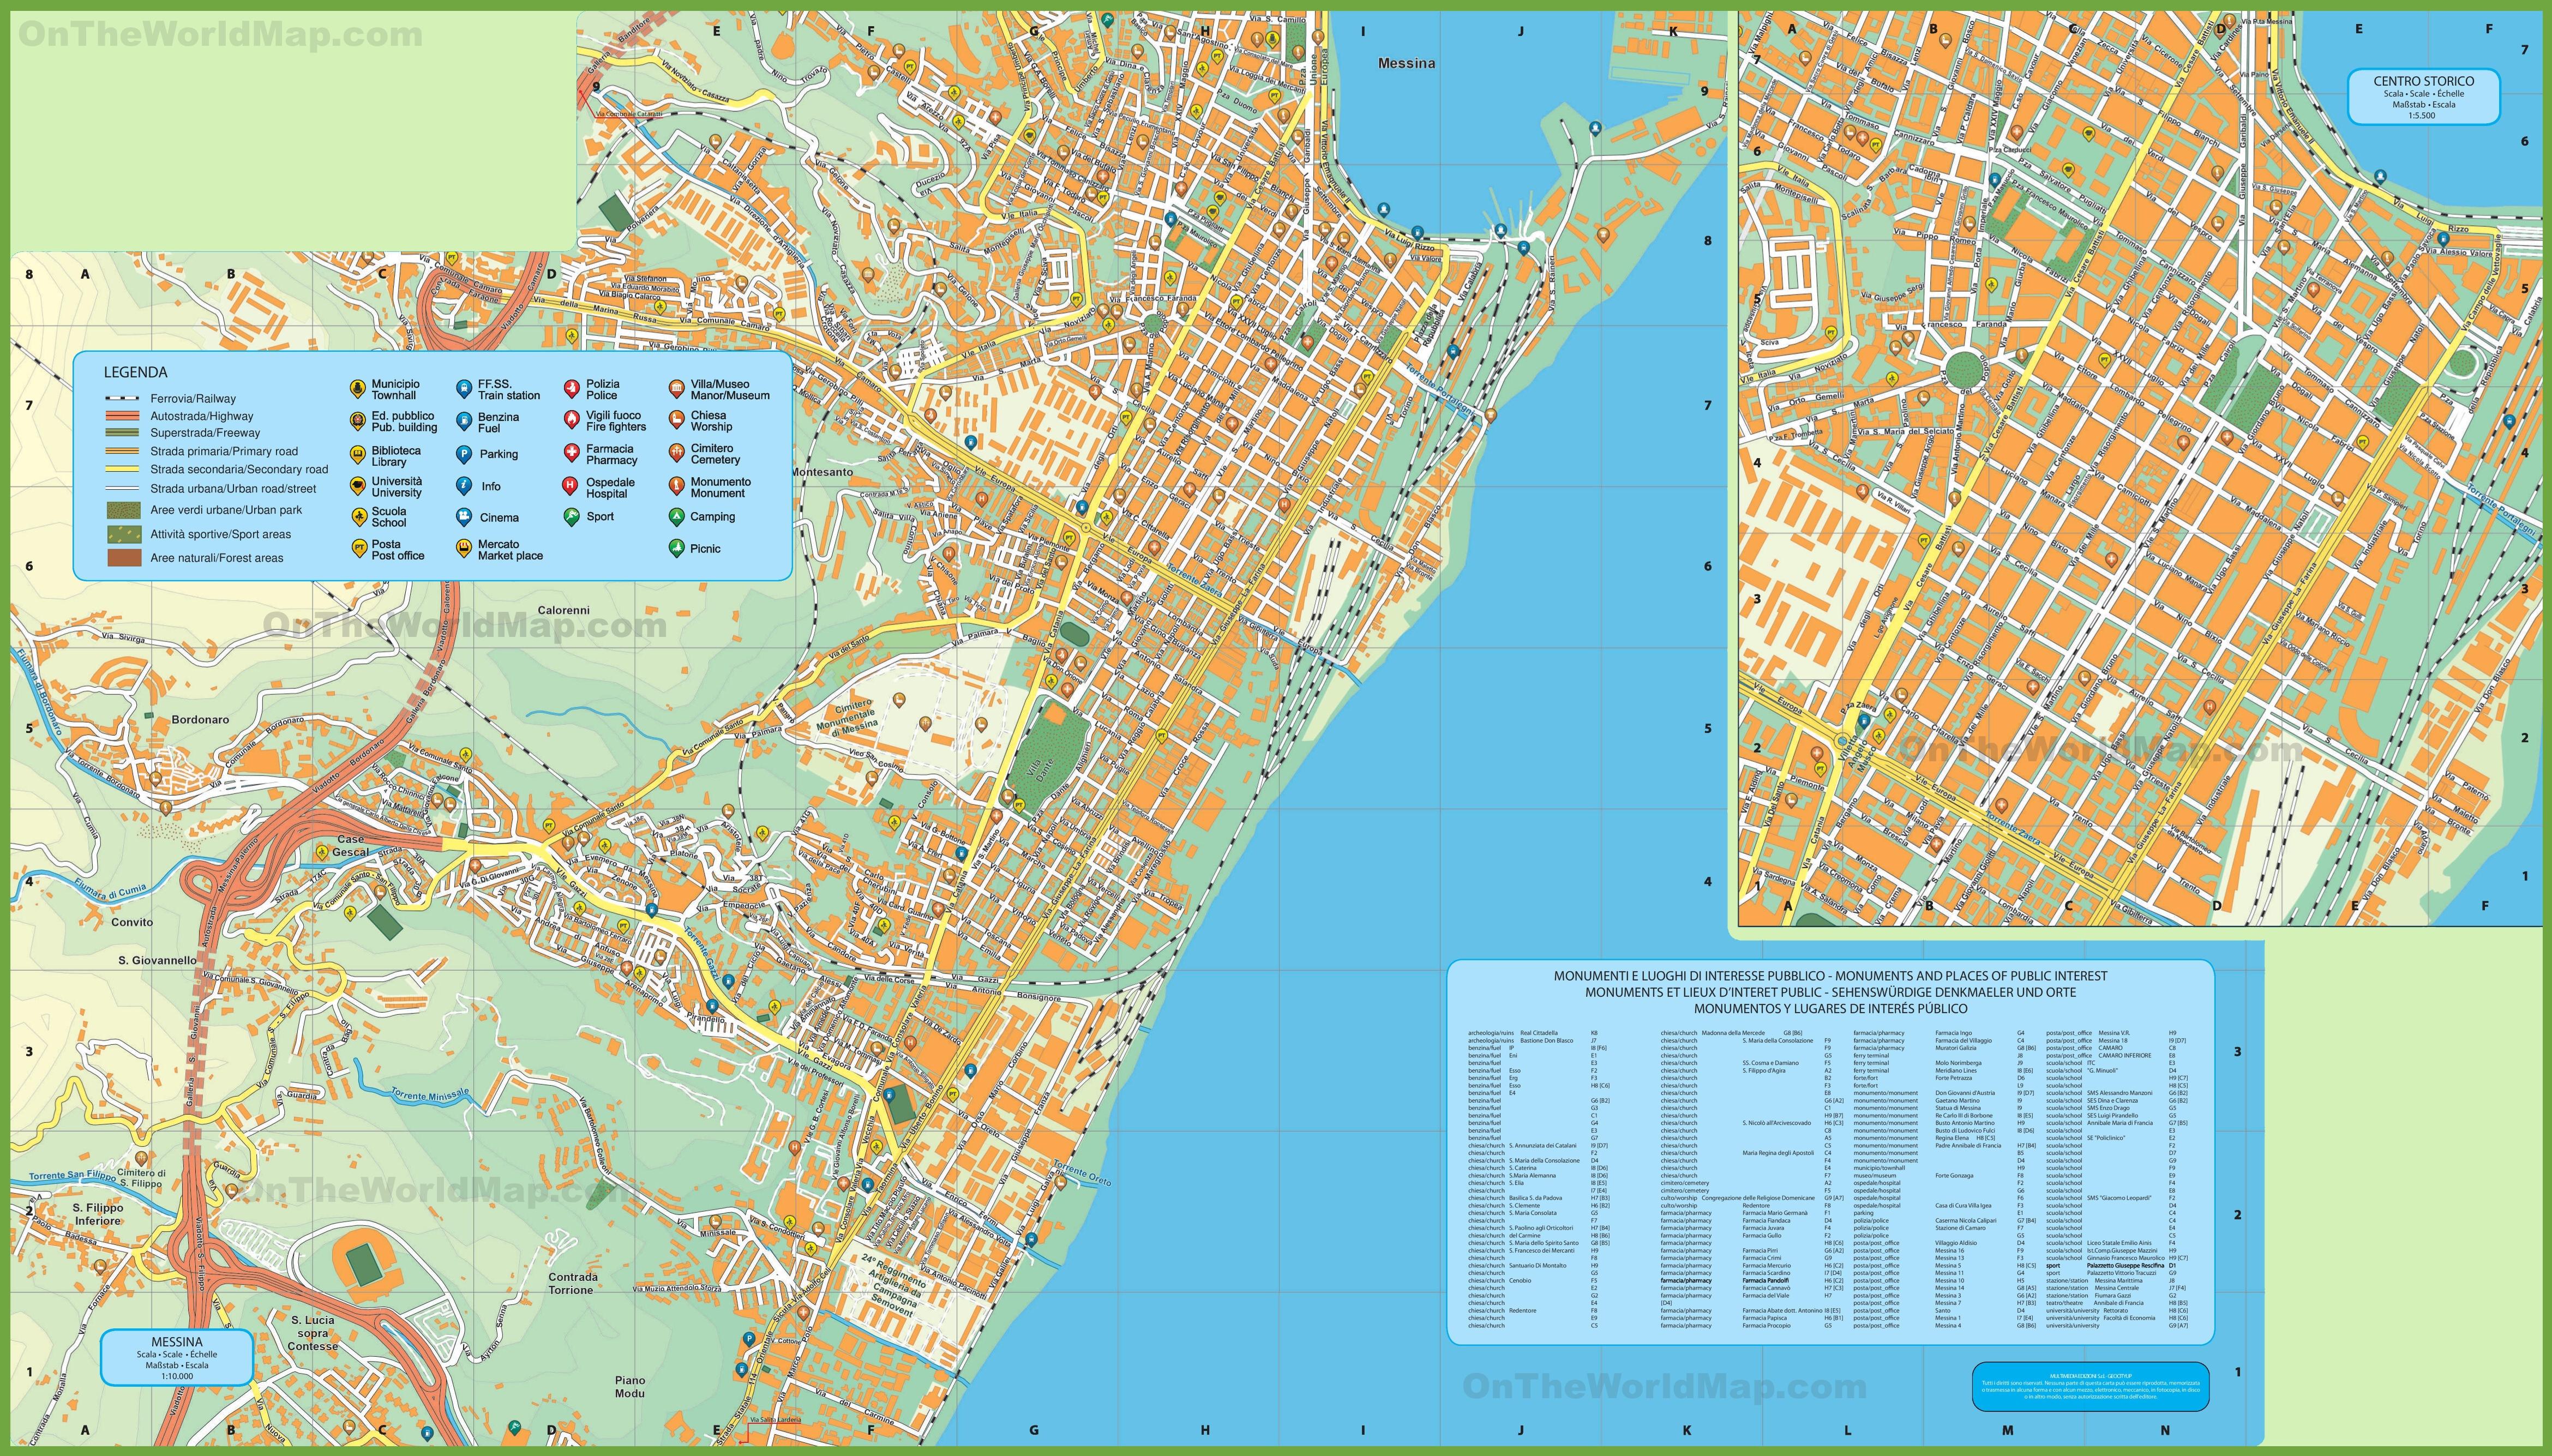 Messina tourist map